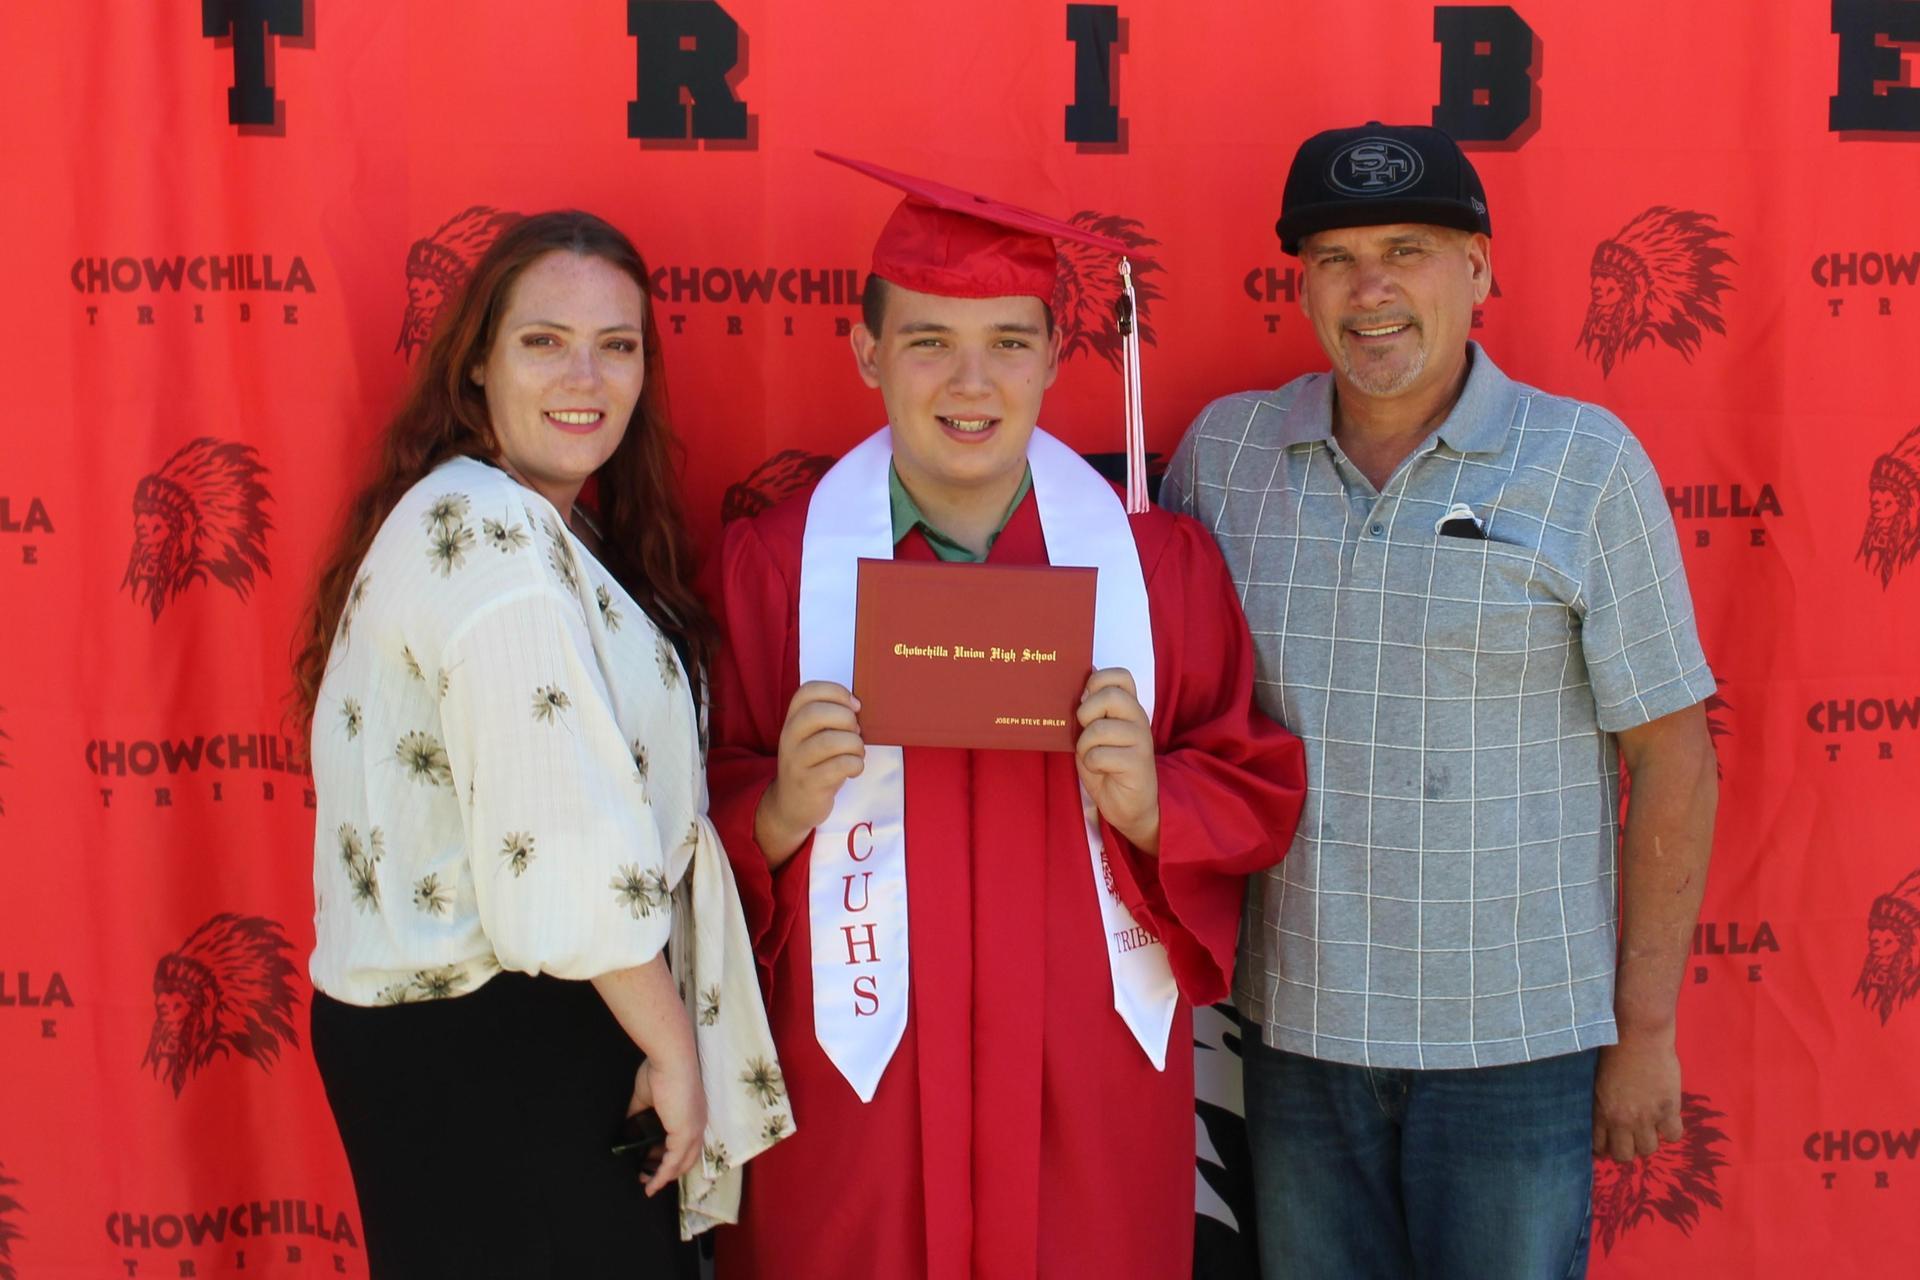 Joseph Birlew and family